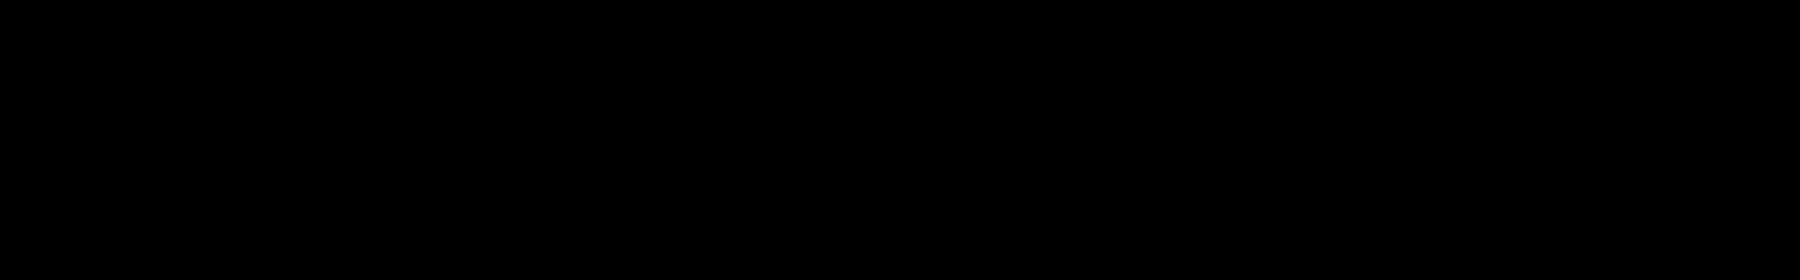 RNB X VOX audio waveform